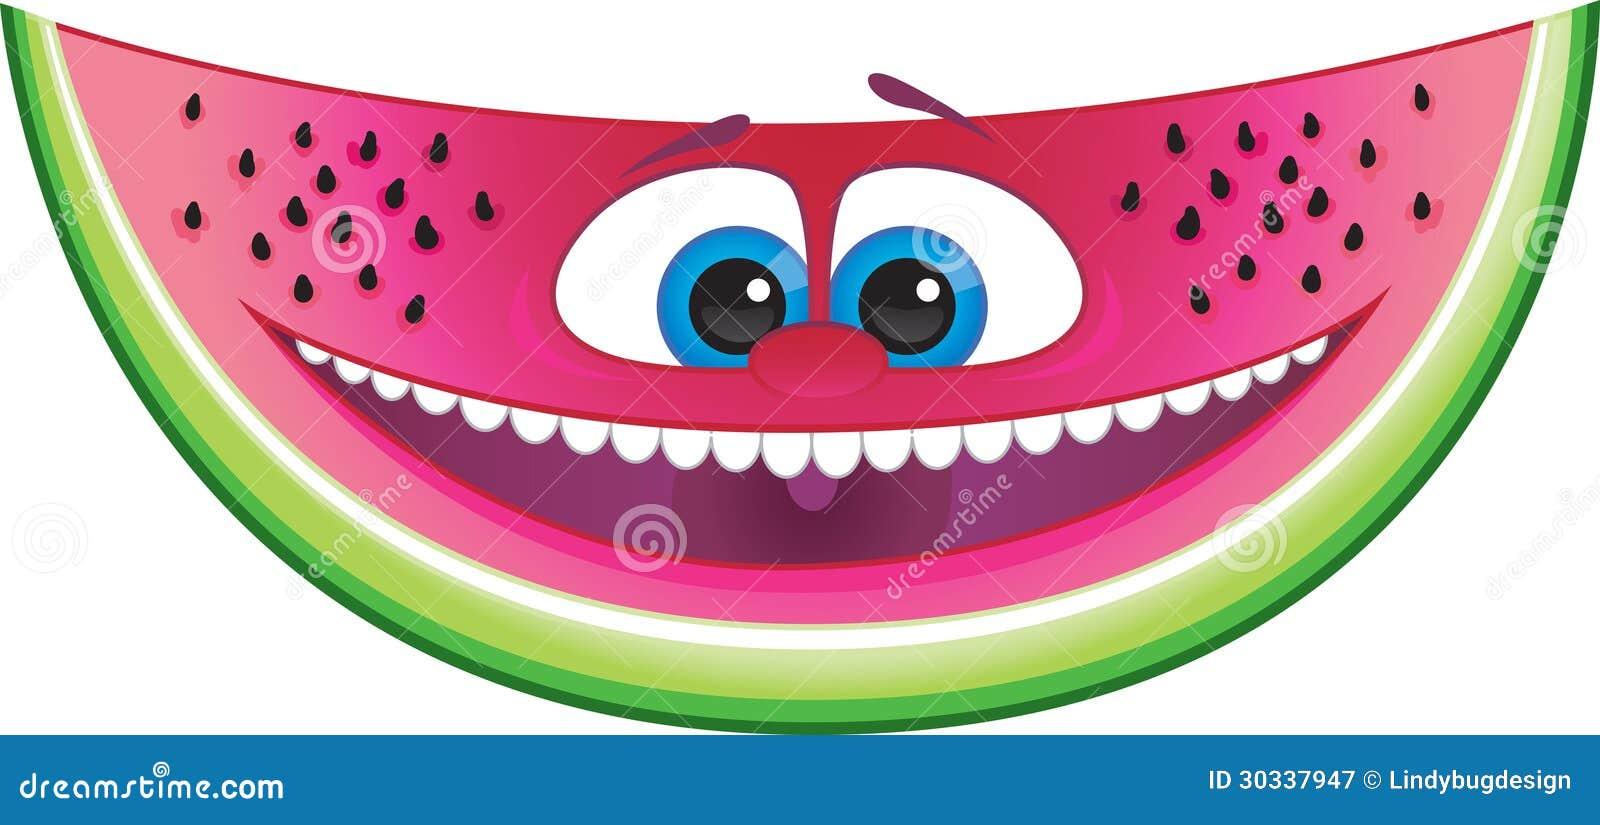 Watermelon Cartoon Royalty Free Stock Photography - Image  30337947Watermelon Cartoon Characters